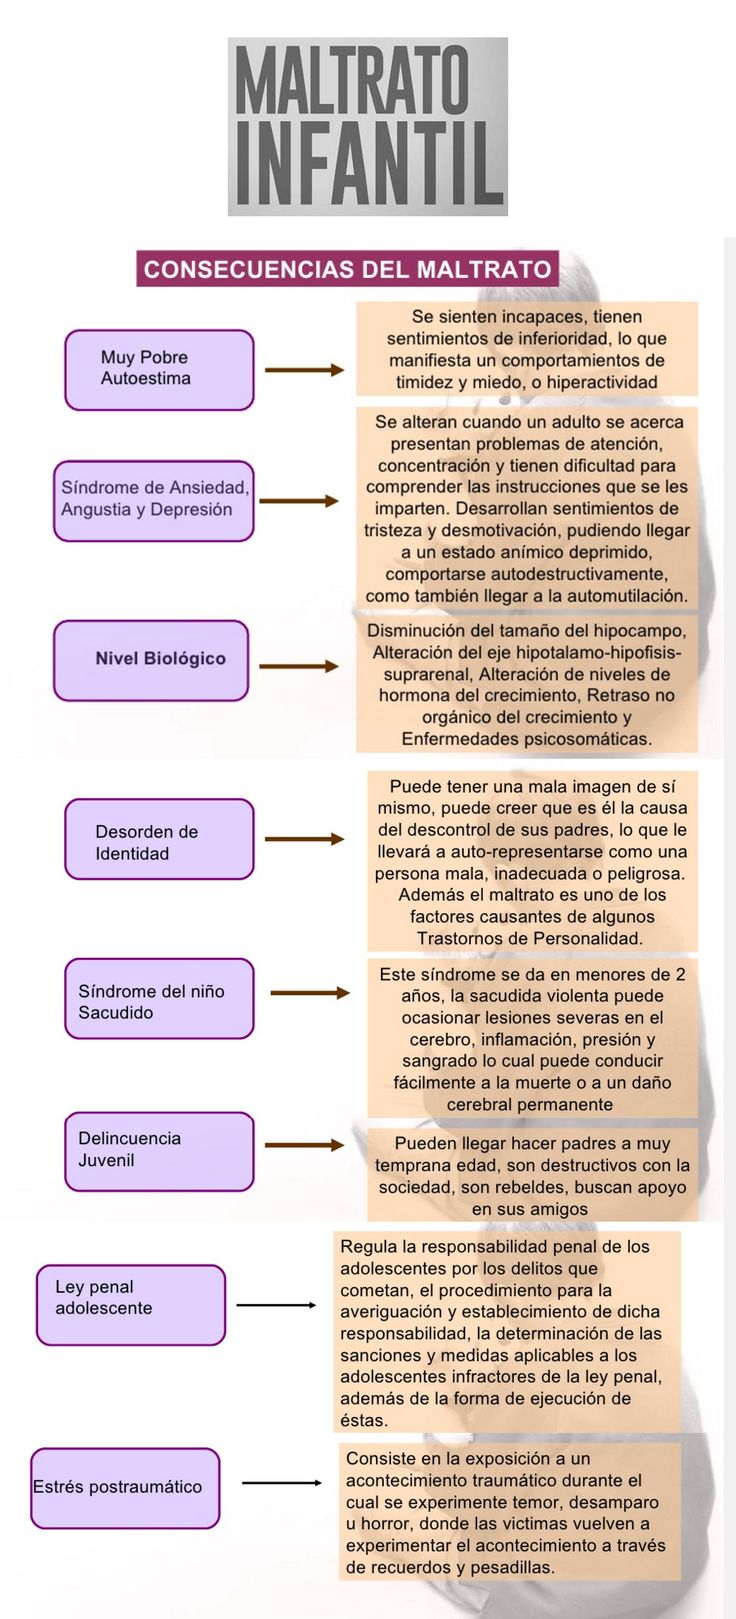 ... CONSECUENCIAS DEL MALTRATO INFANTIL.  http://es.slideshare.net/calapatardo/maltrato-infantil-y-psquiatria-forense